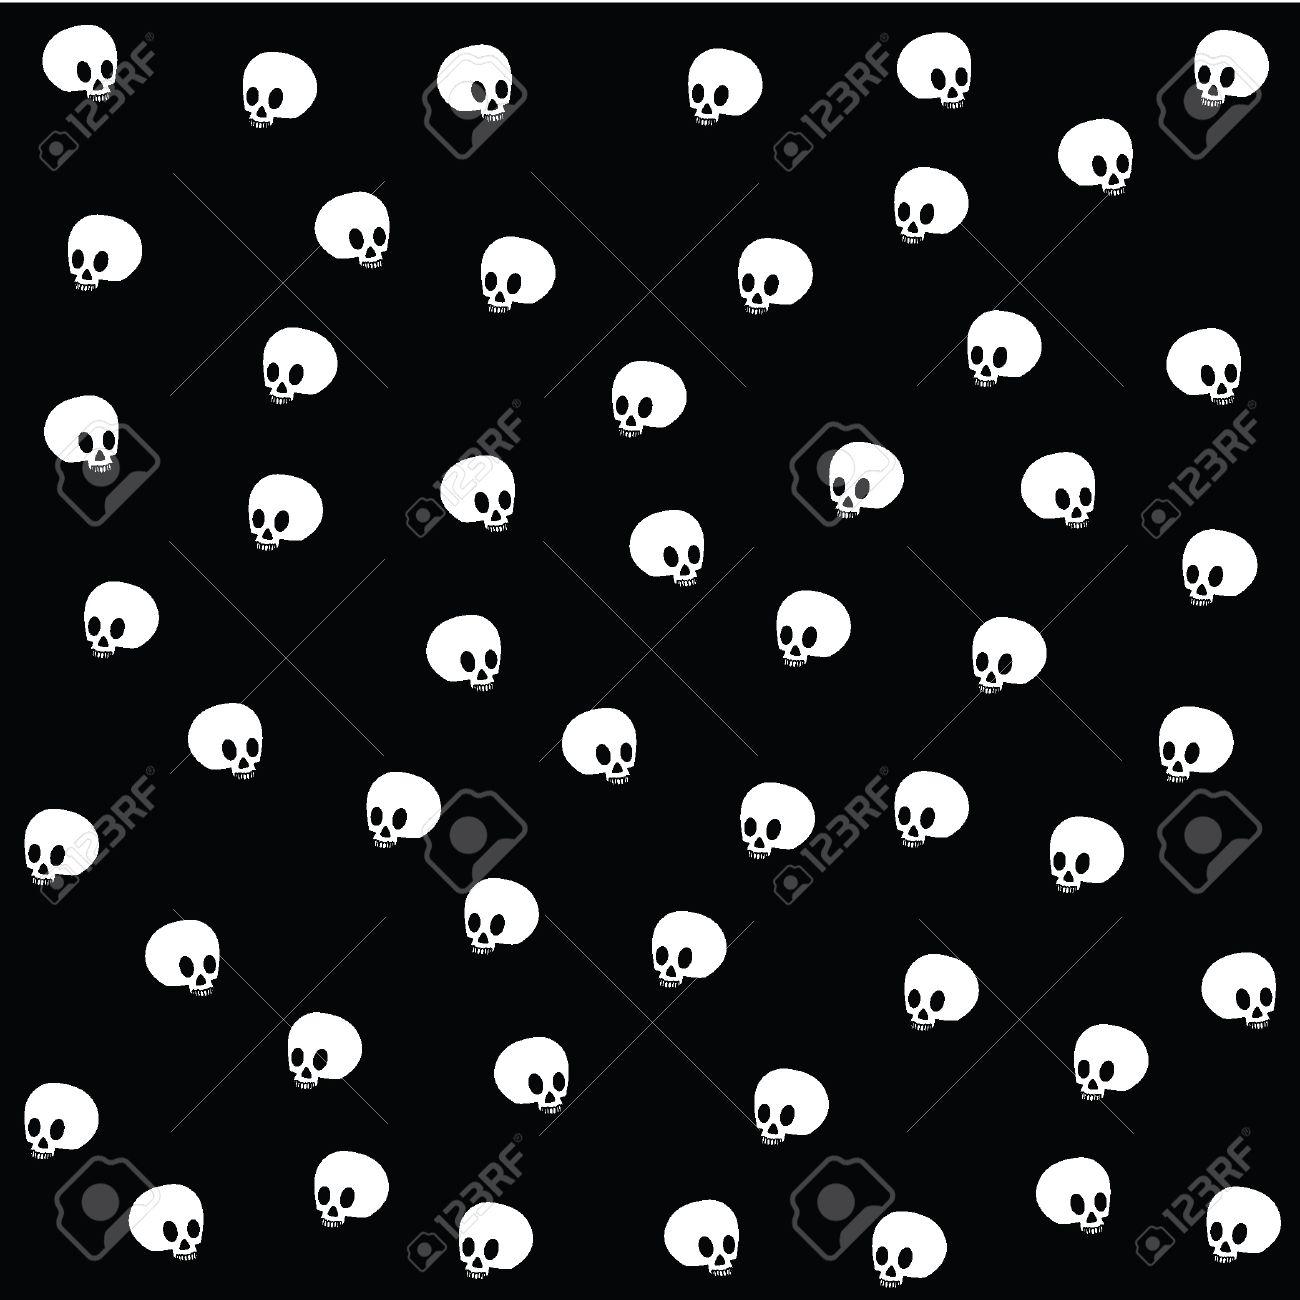 Great Wallpaper Halloween Skull - 10993842-halloween-wallpaper-with-skulls-on-black  Collection_604334.jpg